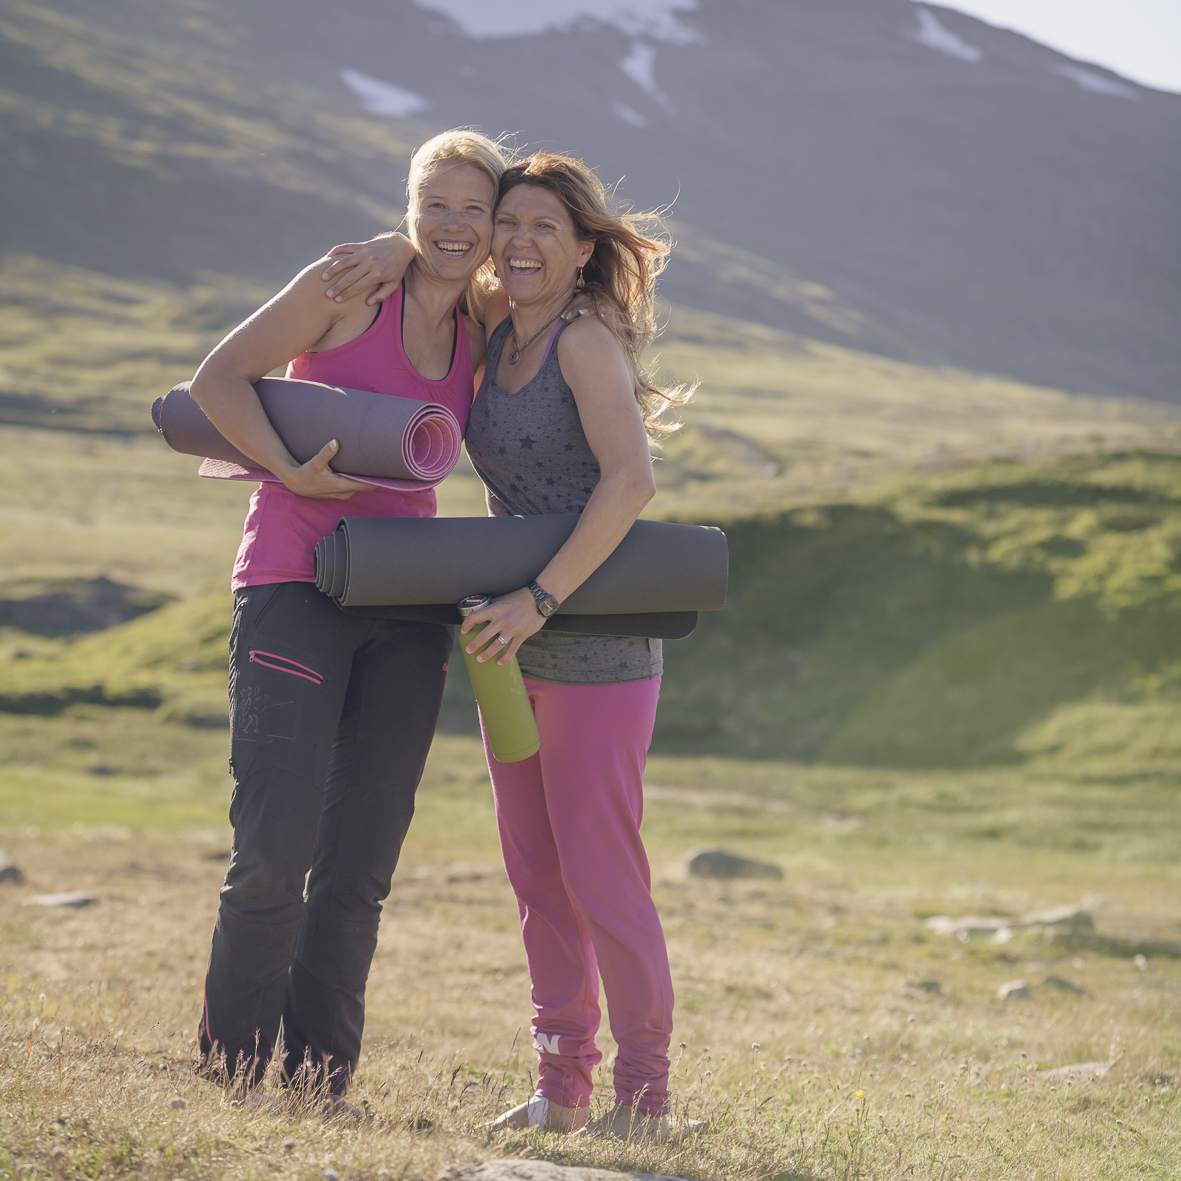 Evelina Åslund, Cecilia Götherström, Studio Stark, JoyEvent, Yoga, Hiking, Midnight Sun, vacation, retreat, Helags, National Park, Lapland , Sweden